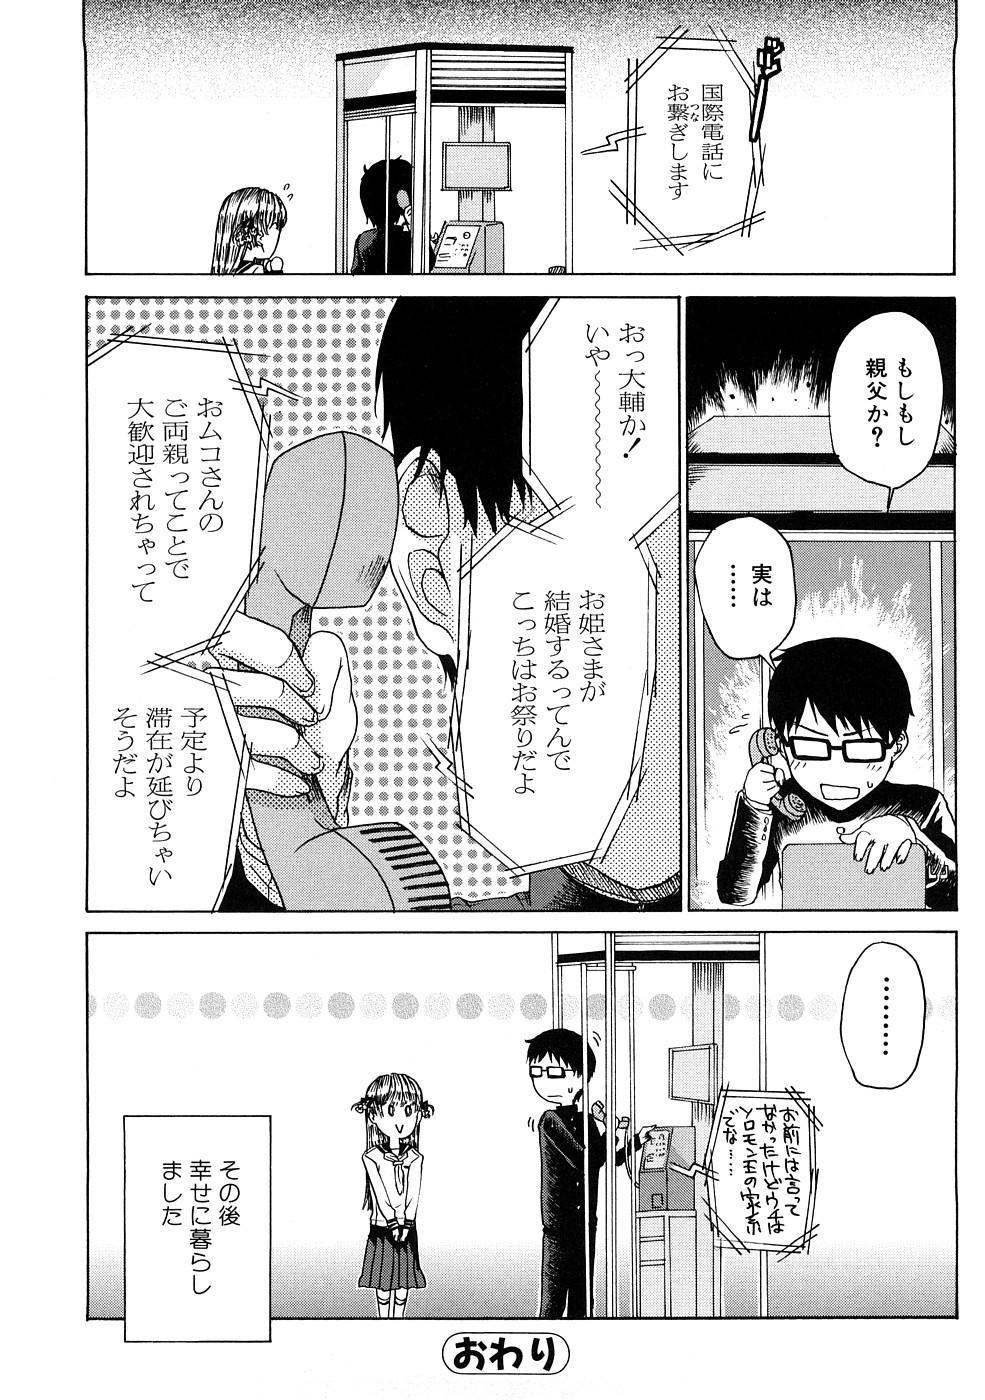 Ecchi de Jibunkatte de Kawaii Ko 19